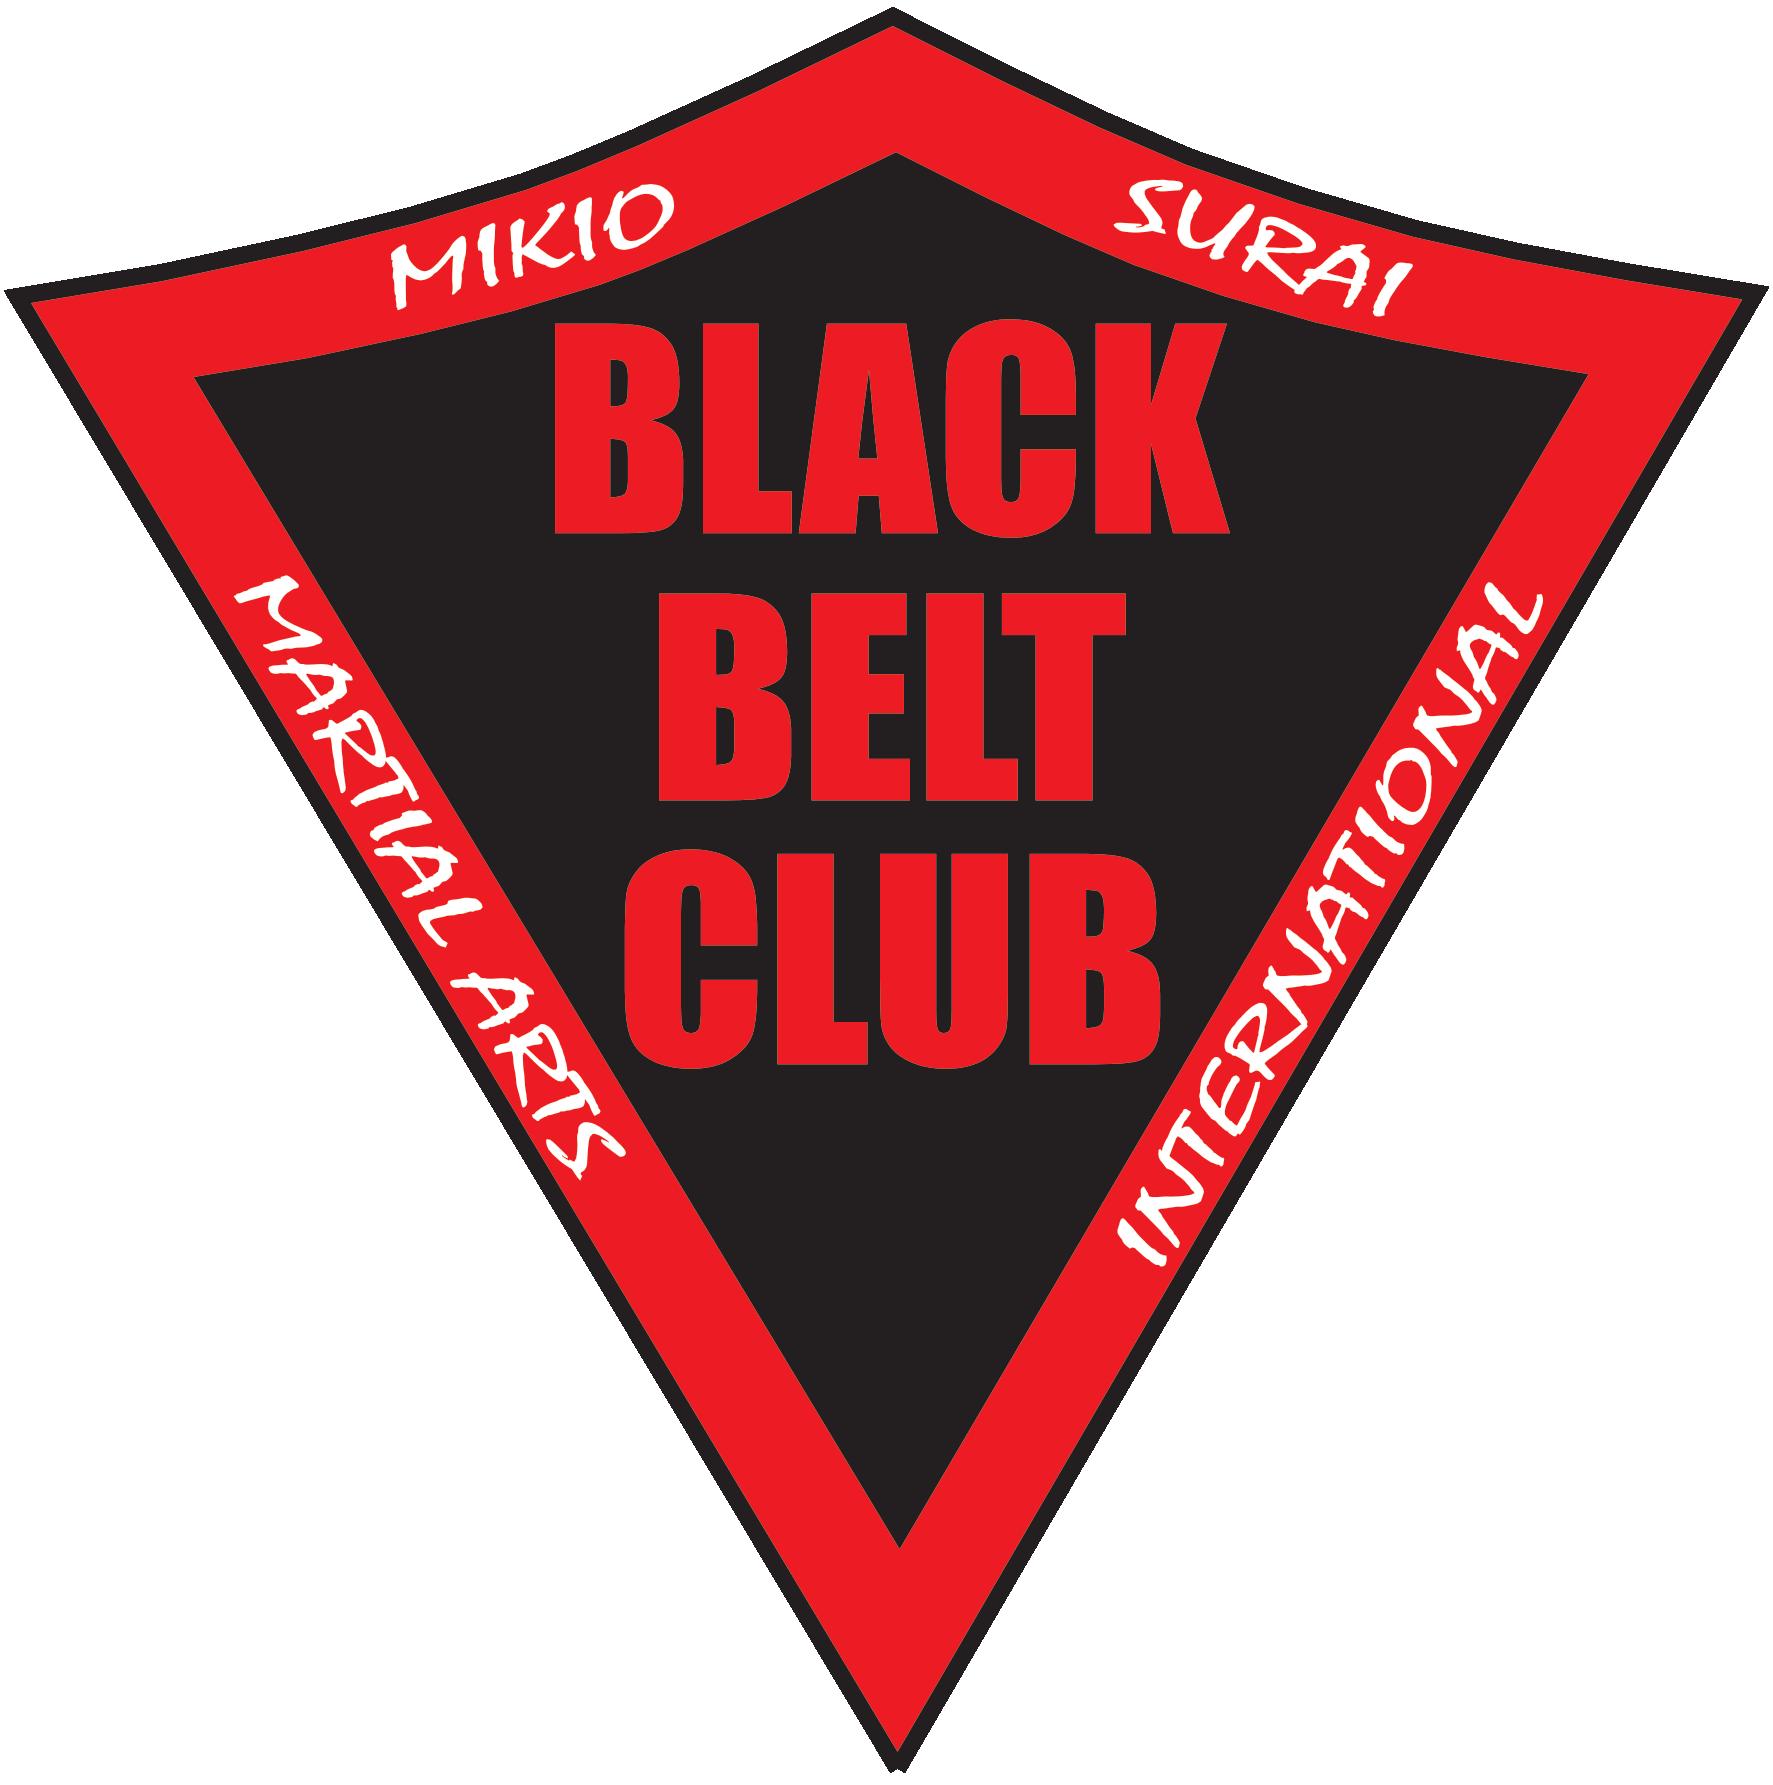 MYLOREAL-BLACK-BELT-CLUB-(nov 12,2016).png